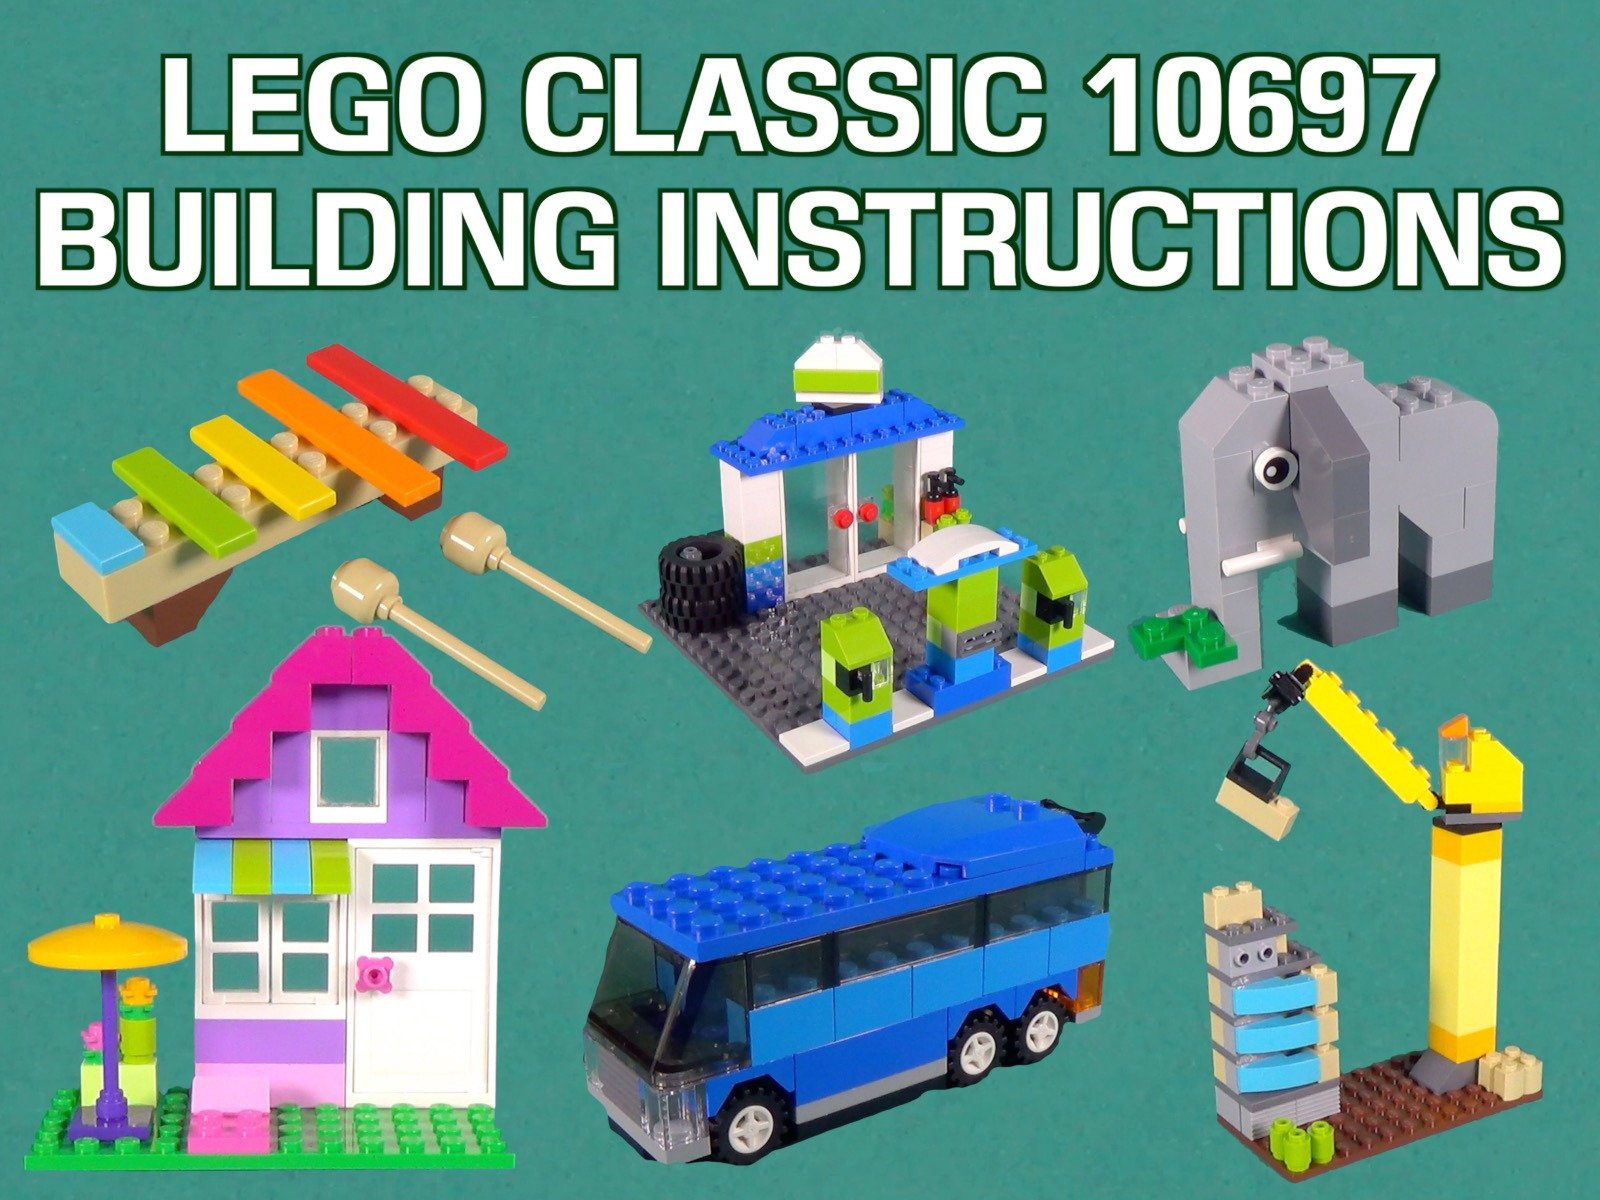 Clip: Lego Classic 10697 Building Instructions - Season 1